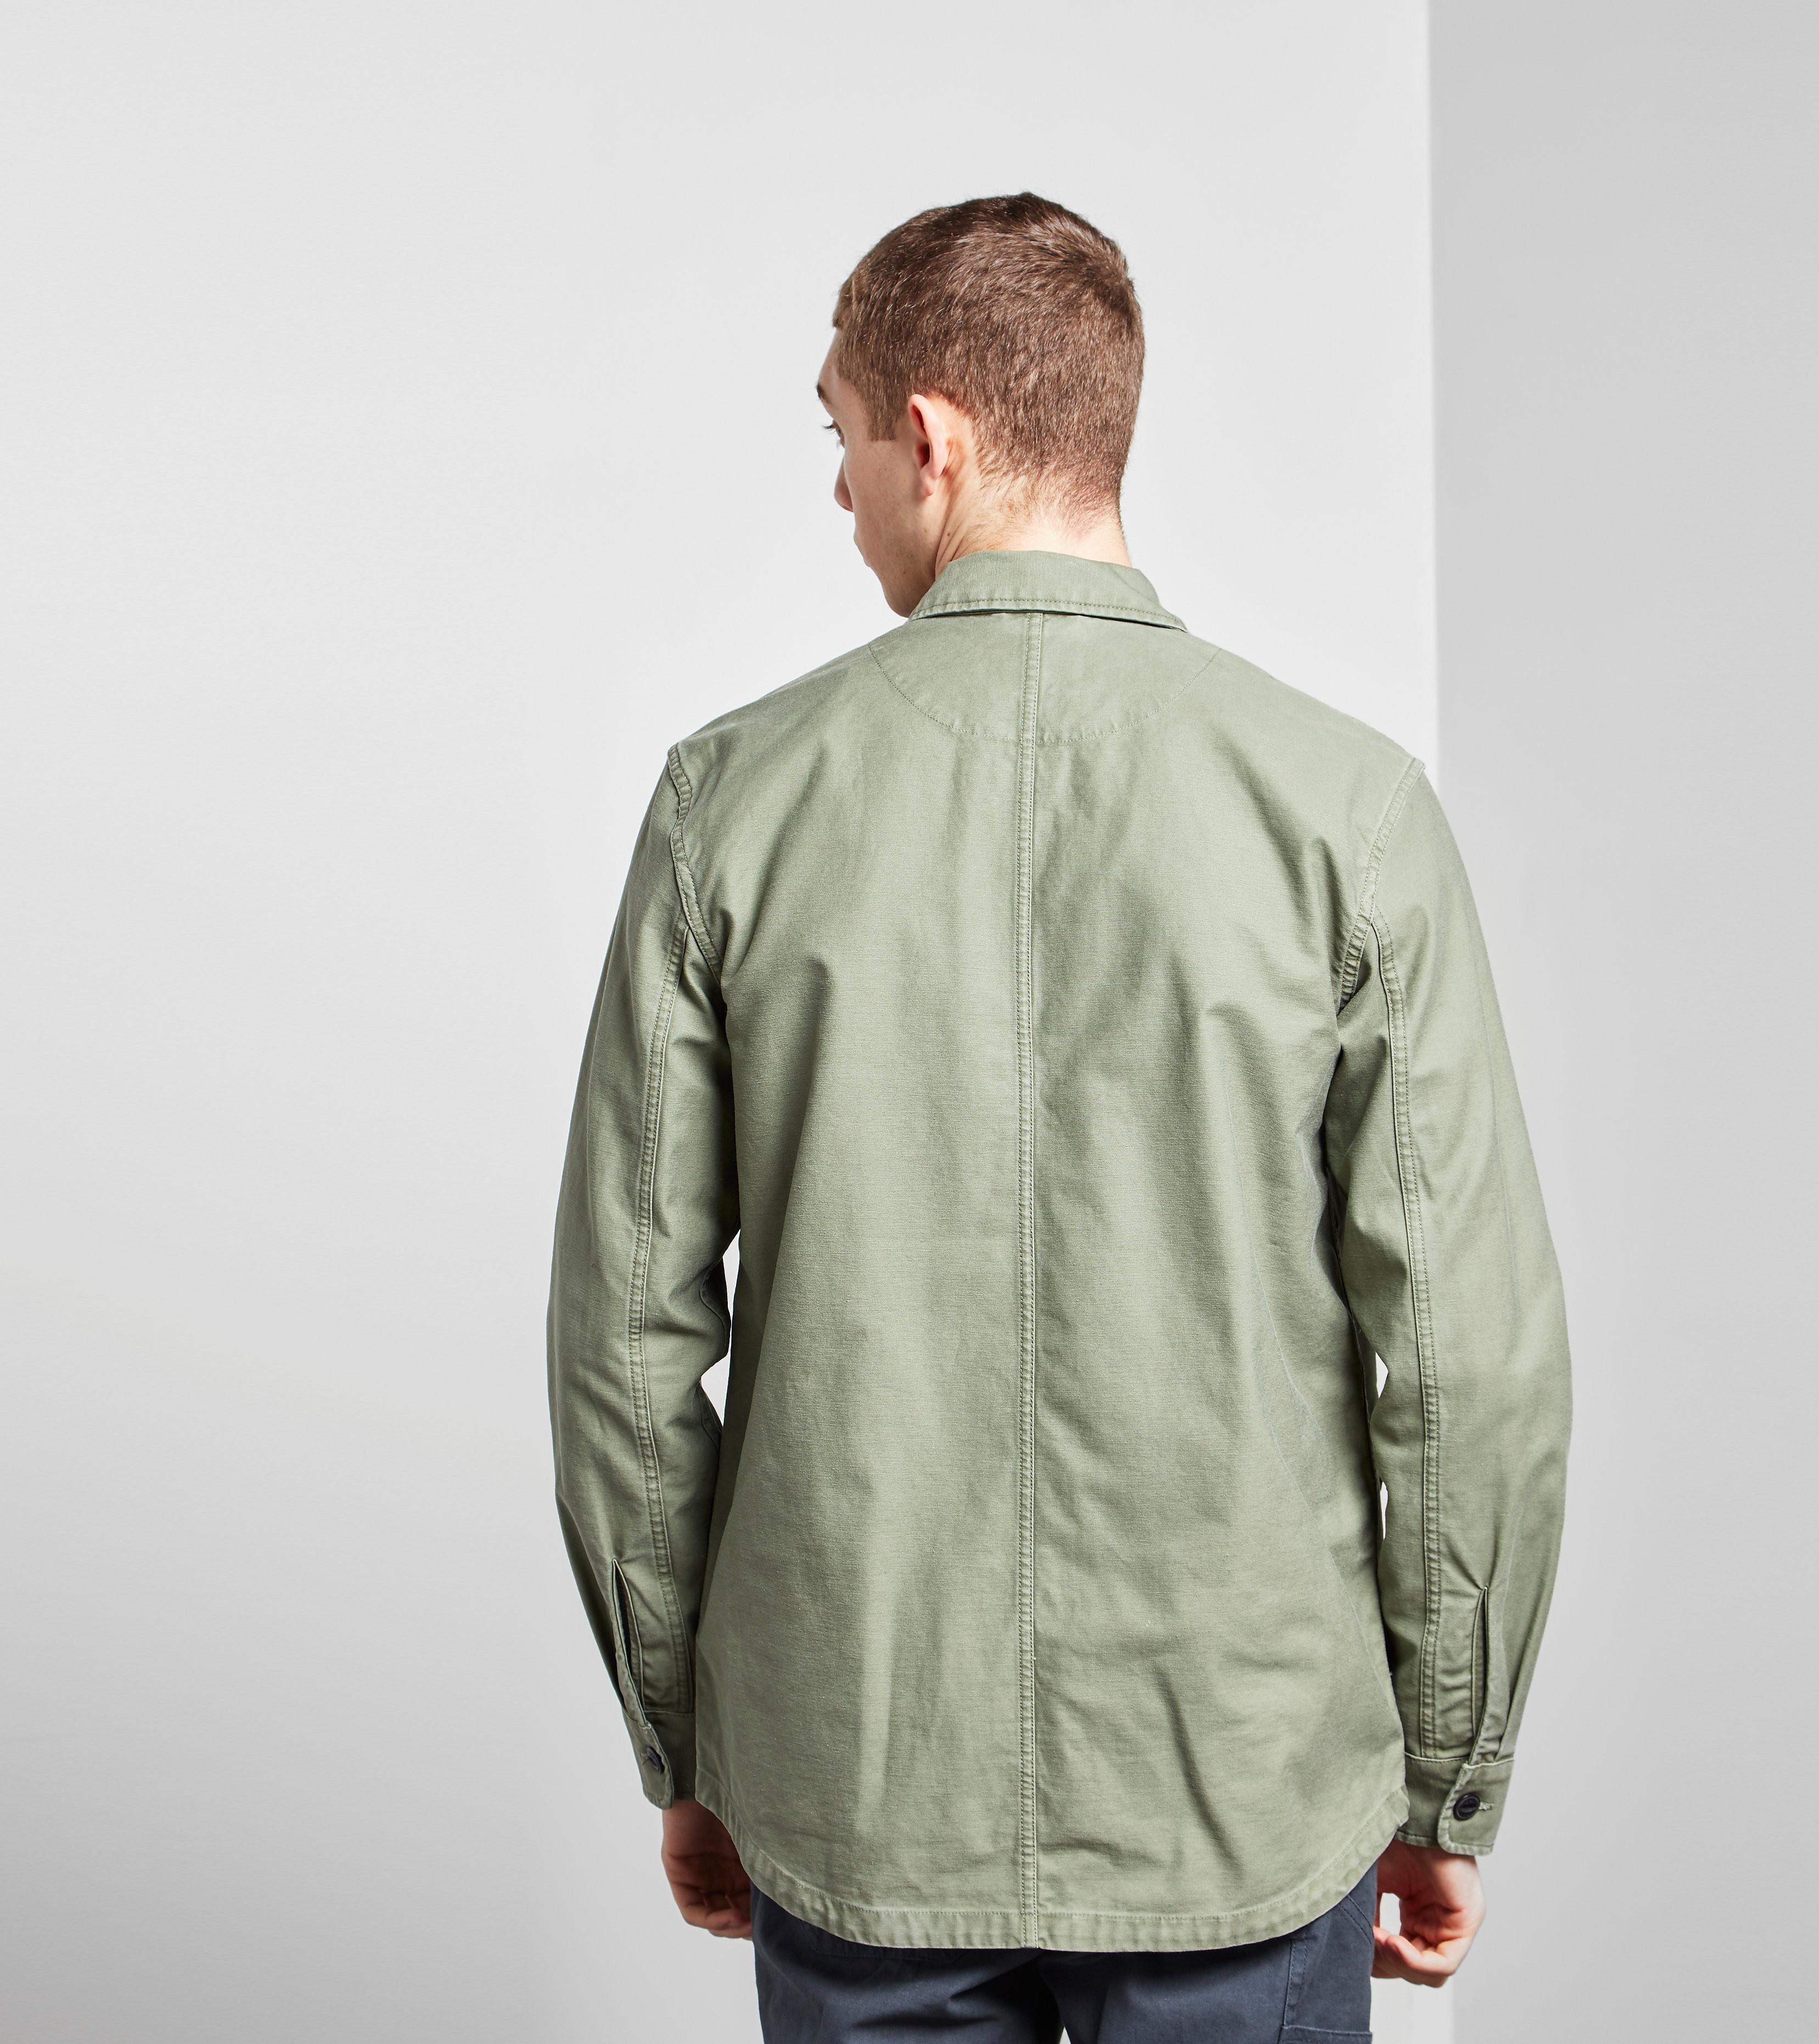 Carhartt WIP Anson Jacket